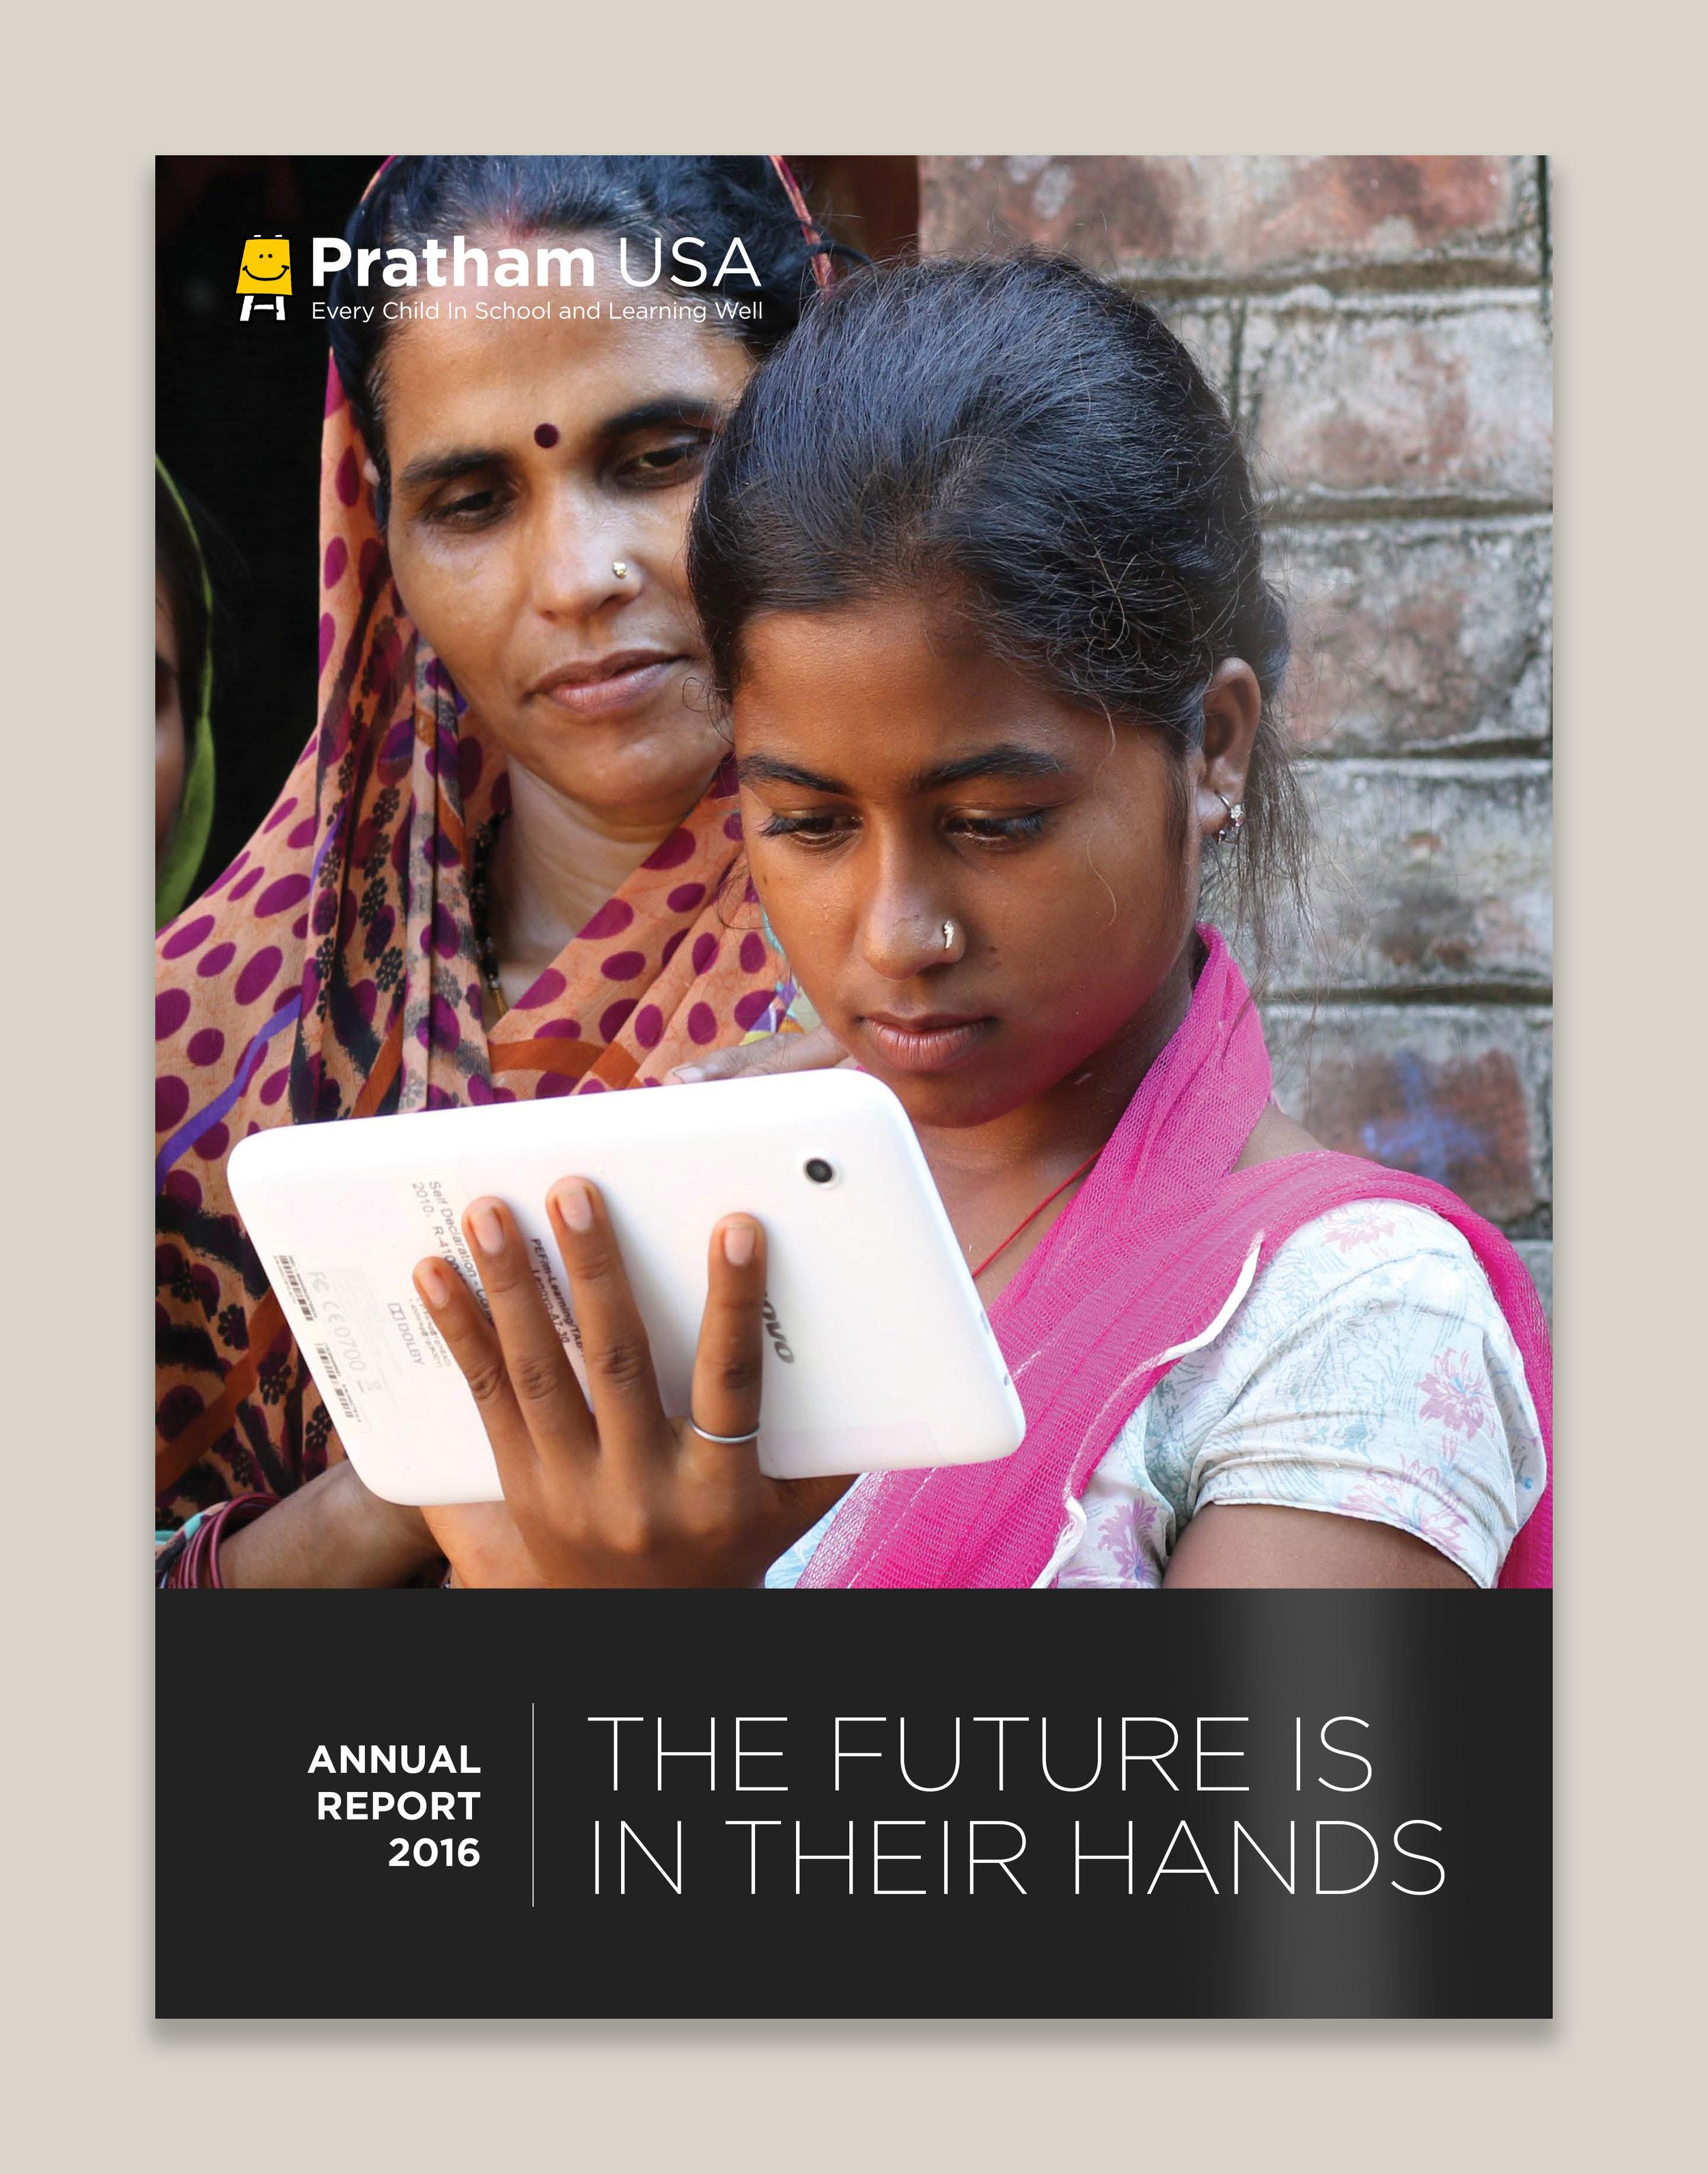 annual report 2016 interactive spreads-1.jpg